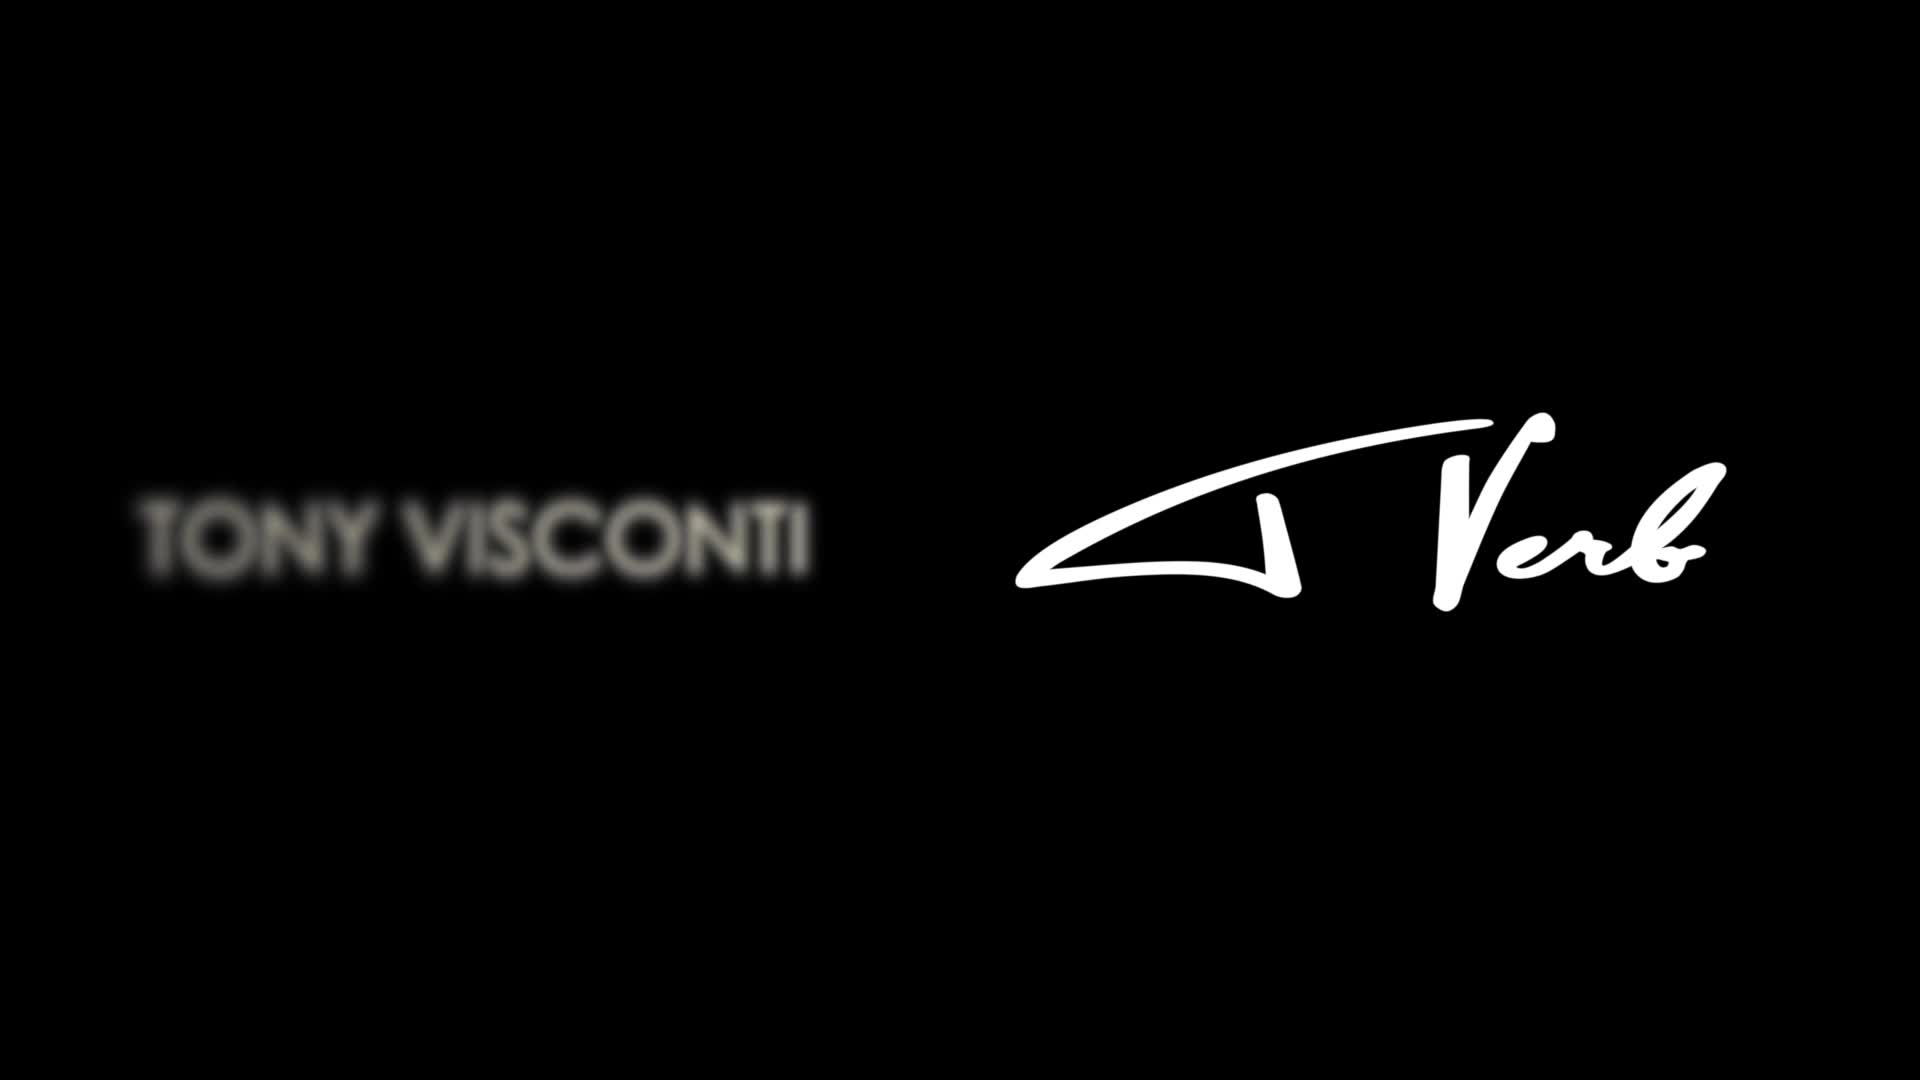 Tony Visconti 介绍 Tverb 插件